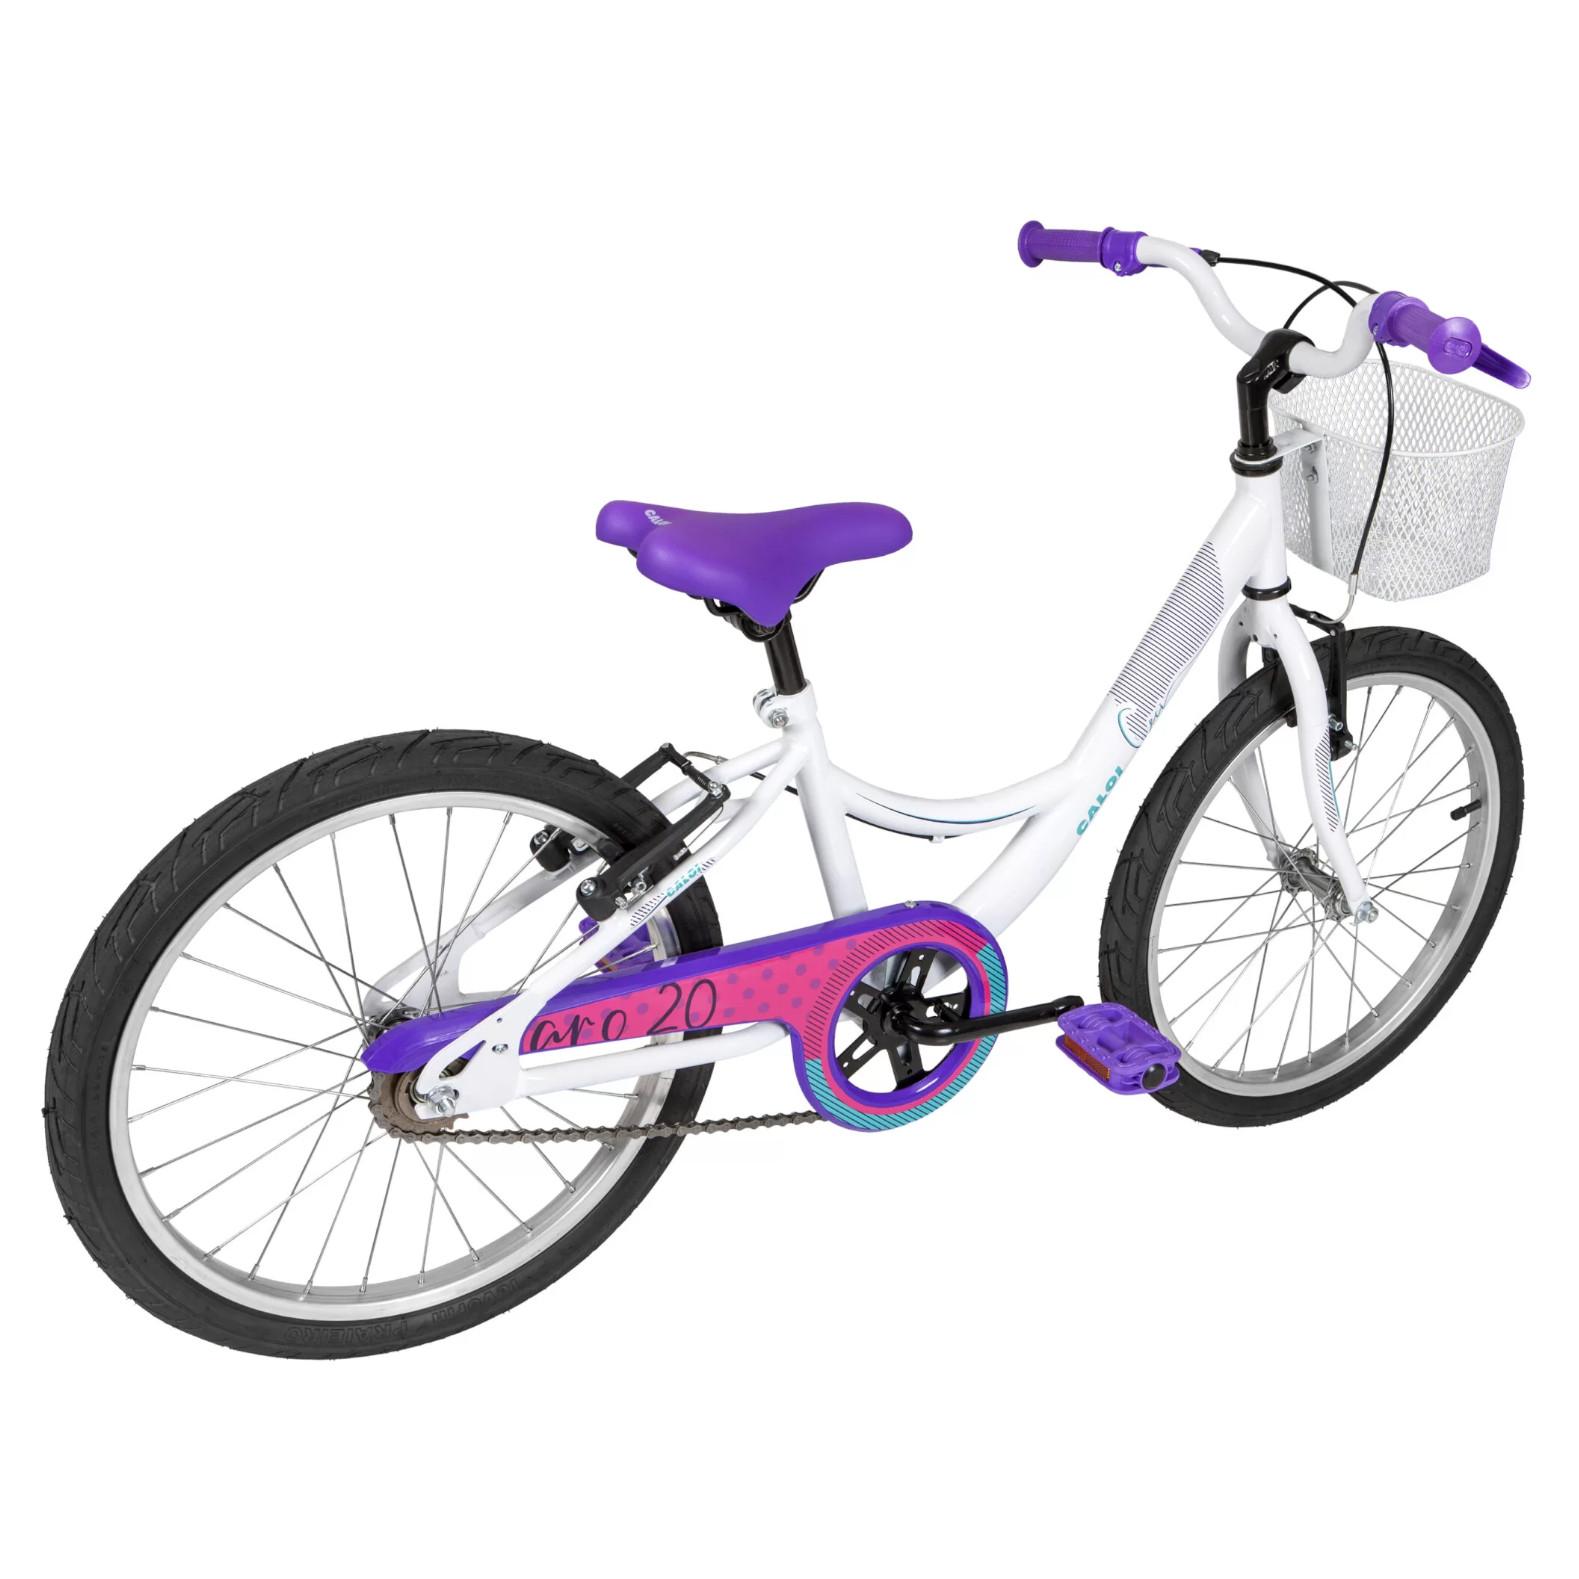 Bicicleta Infantil Caloi Ceci Aro 20 2020